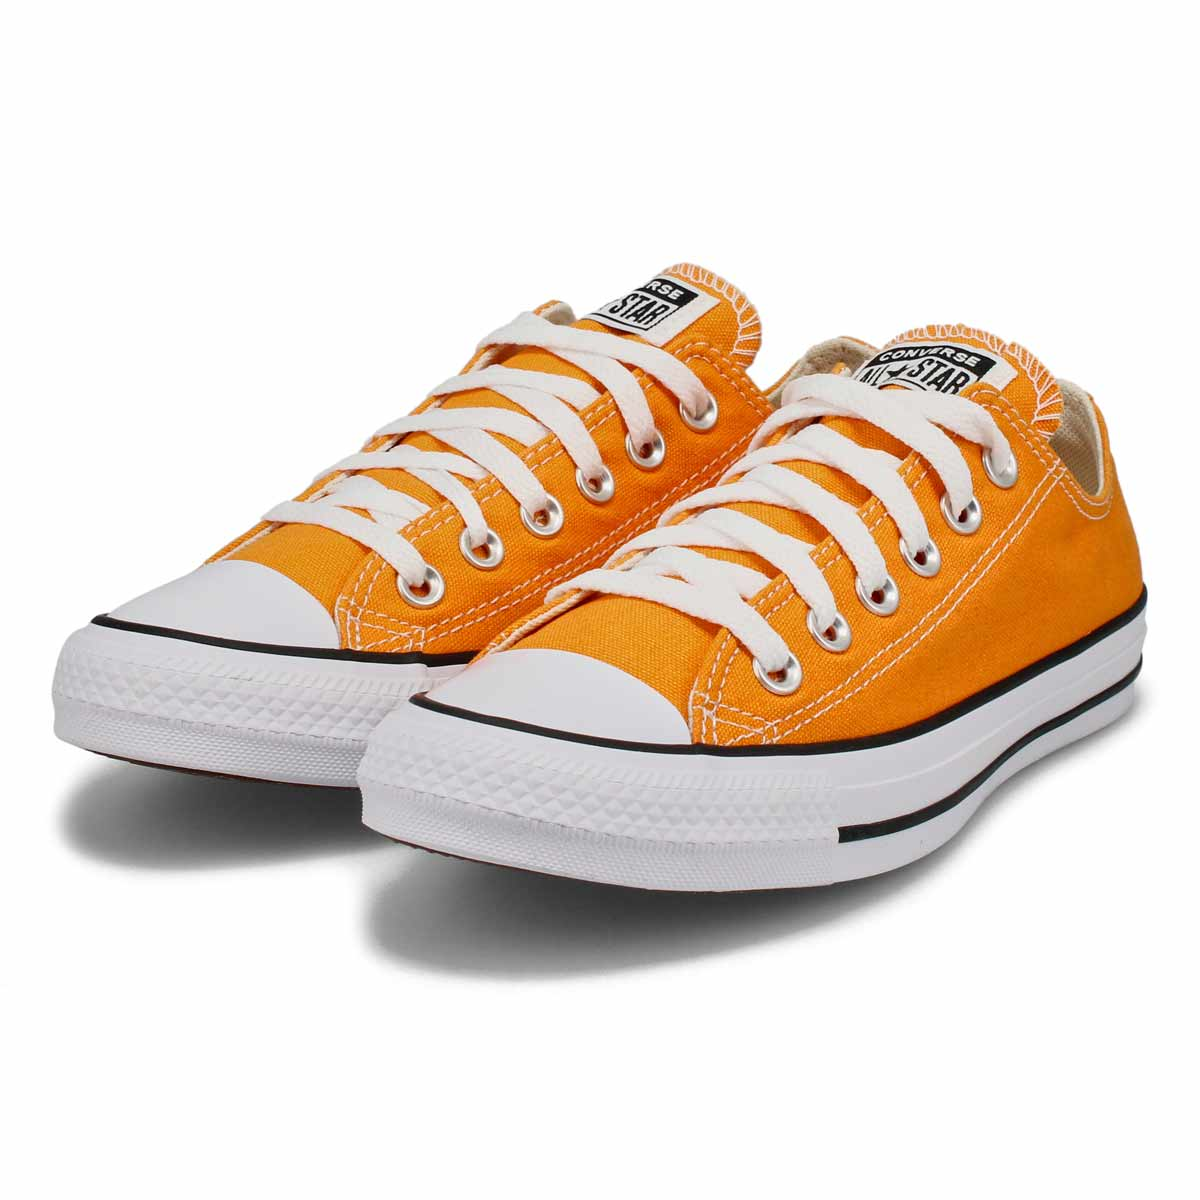 Women's All Star Seasonal Sneaker - Kumquat